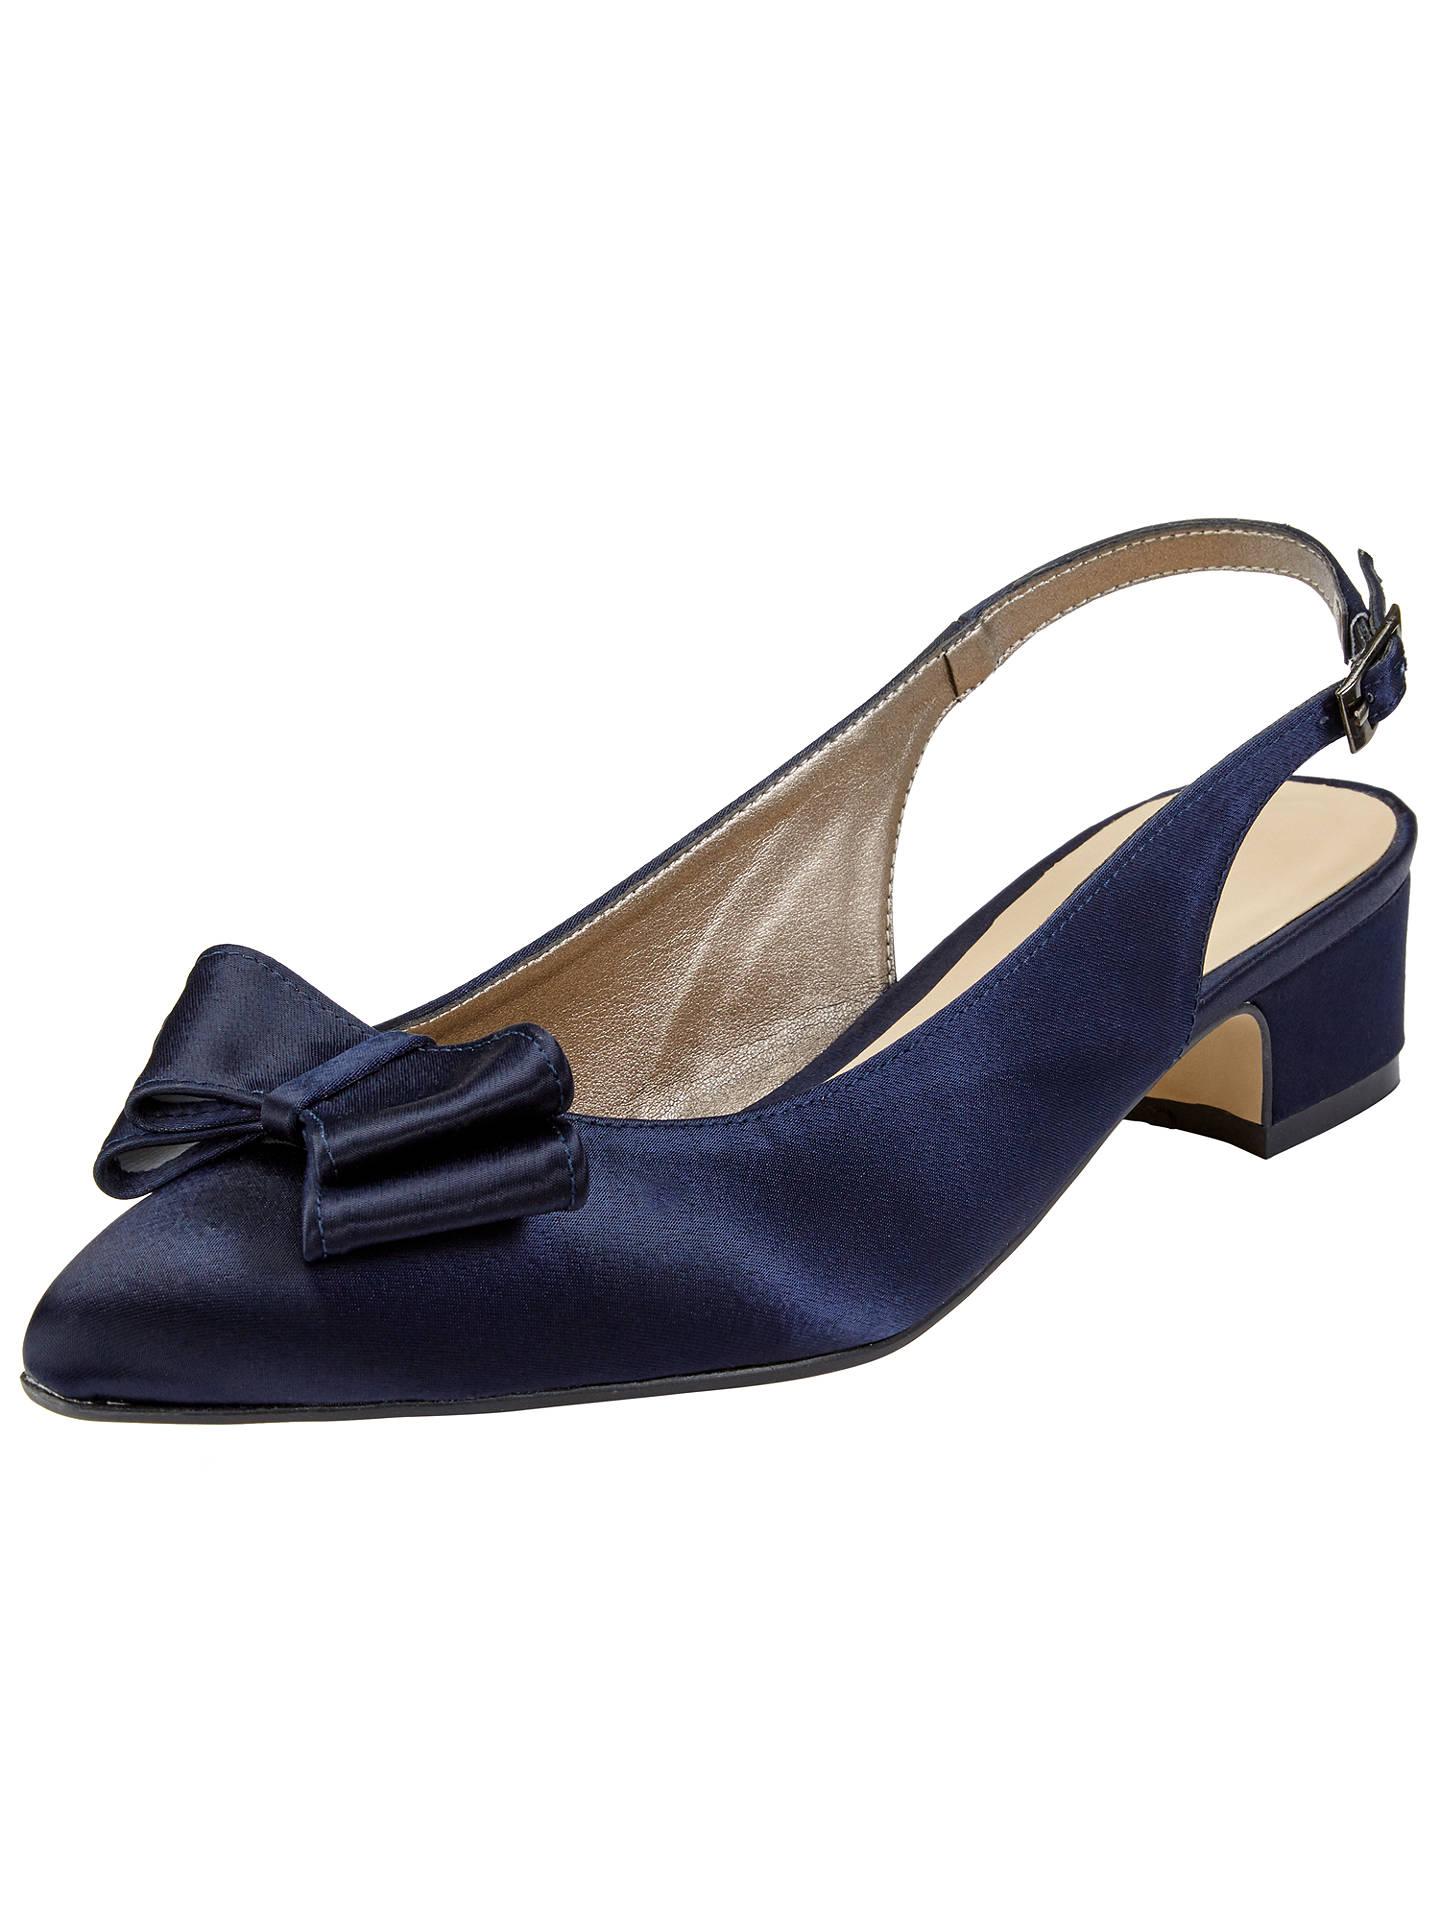 558fad29059 Buy John Lewis   Partners Brooke Bow Sling Back Court Shoes